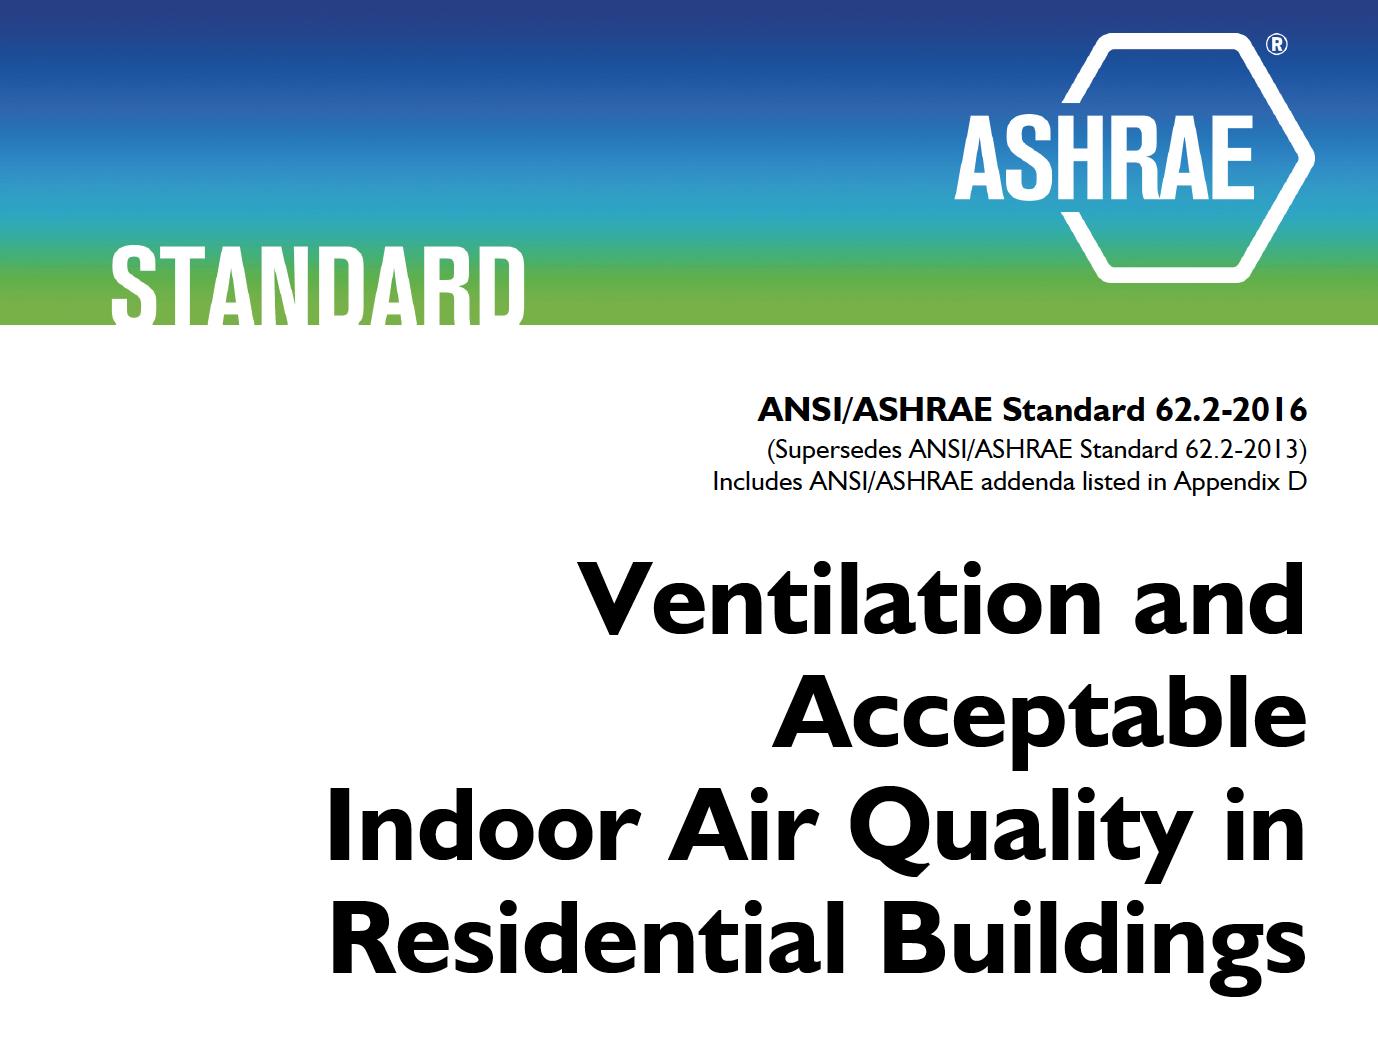 ASHRAE 62.2 standard for residential ventilation